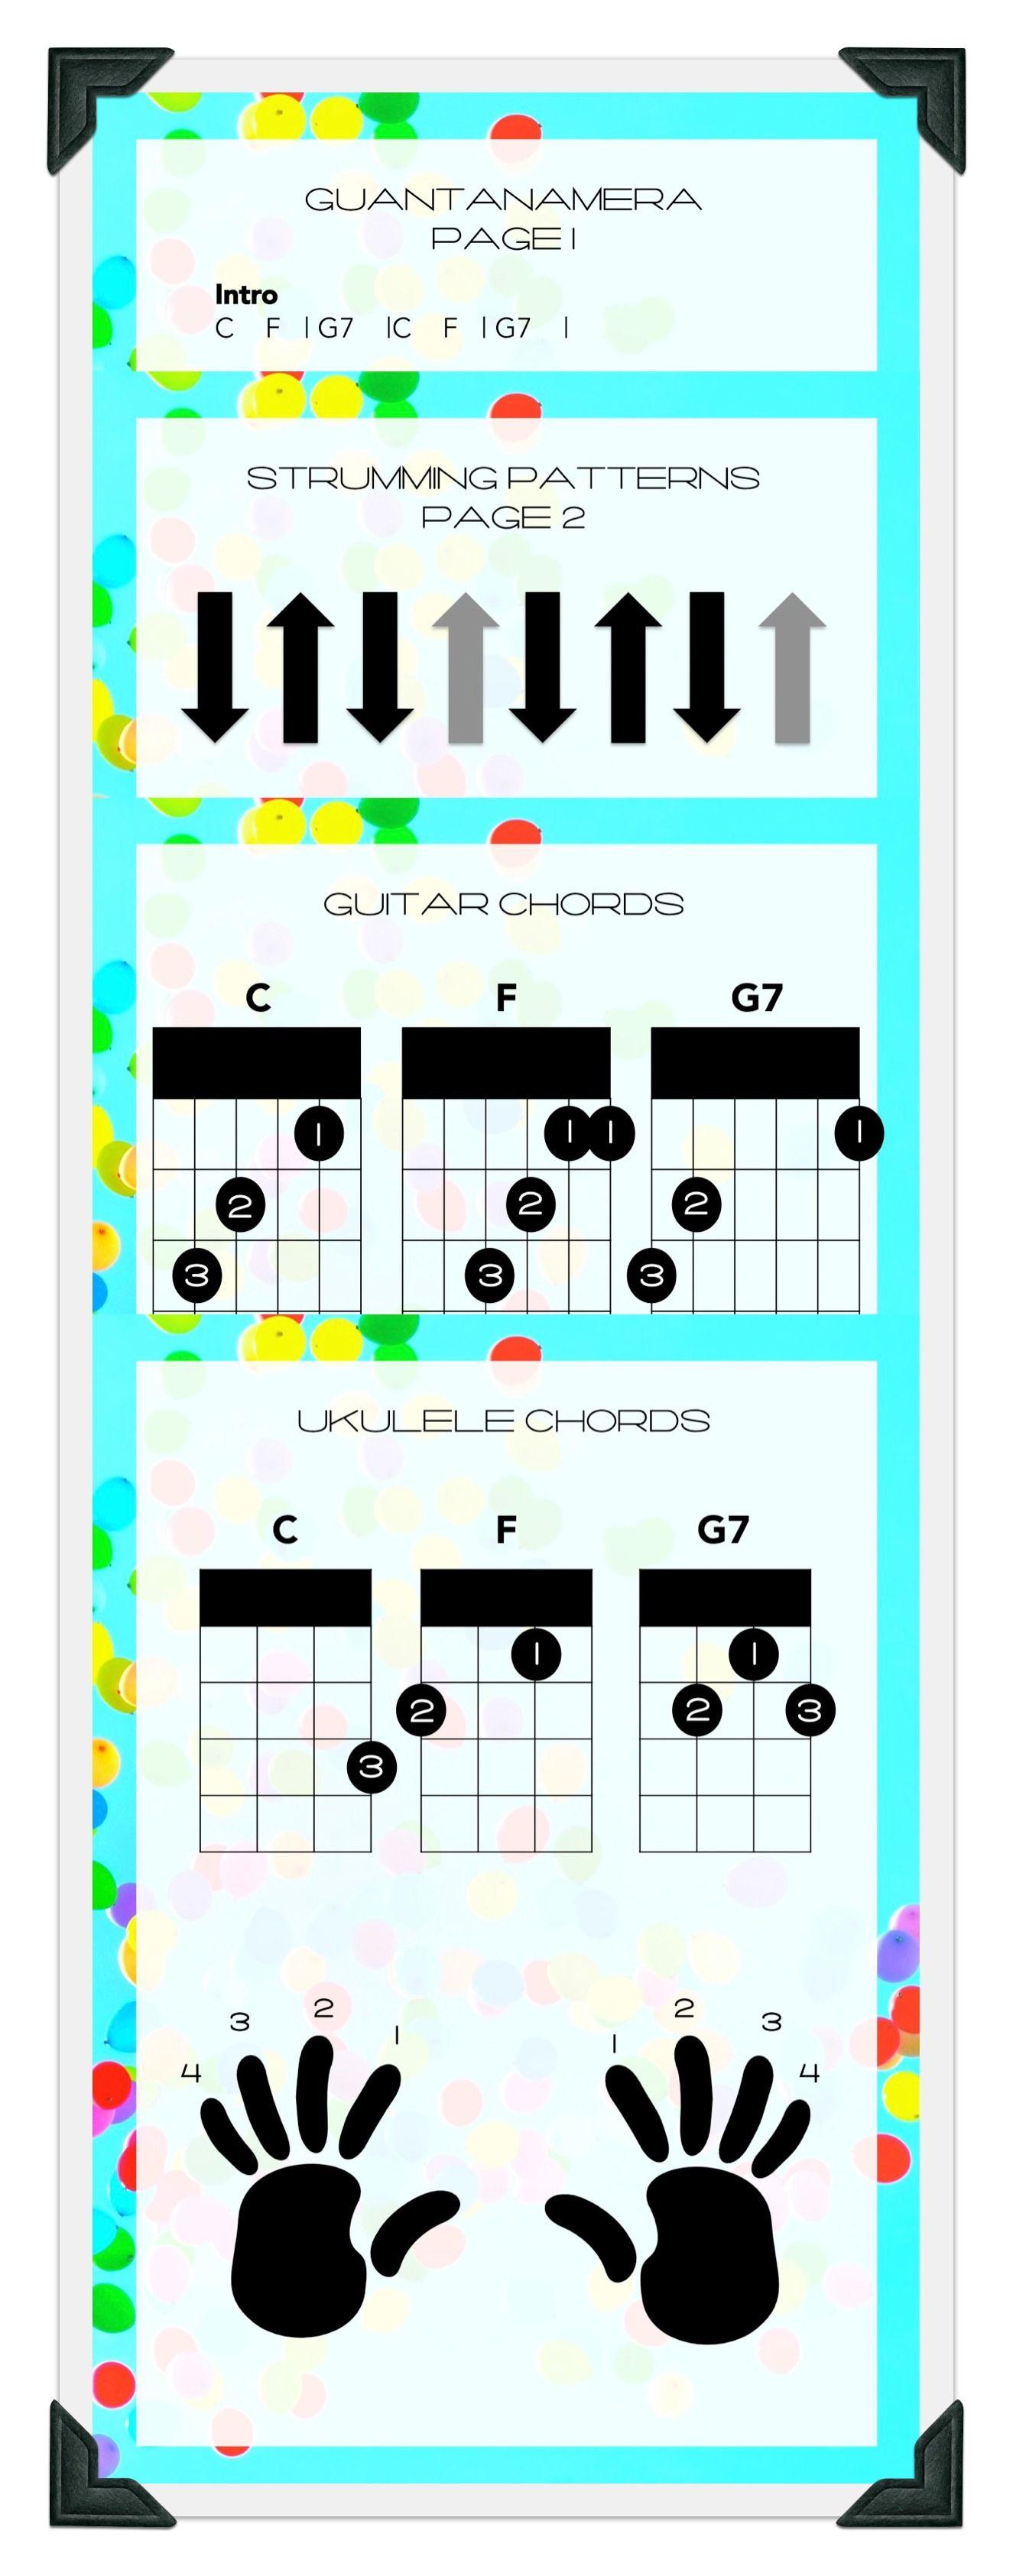 Latin Music Chord Lesson For Ukulele And Guitar Guantanamera La